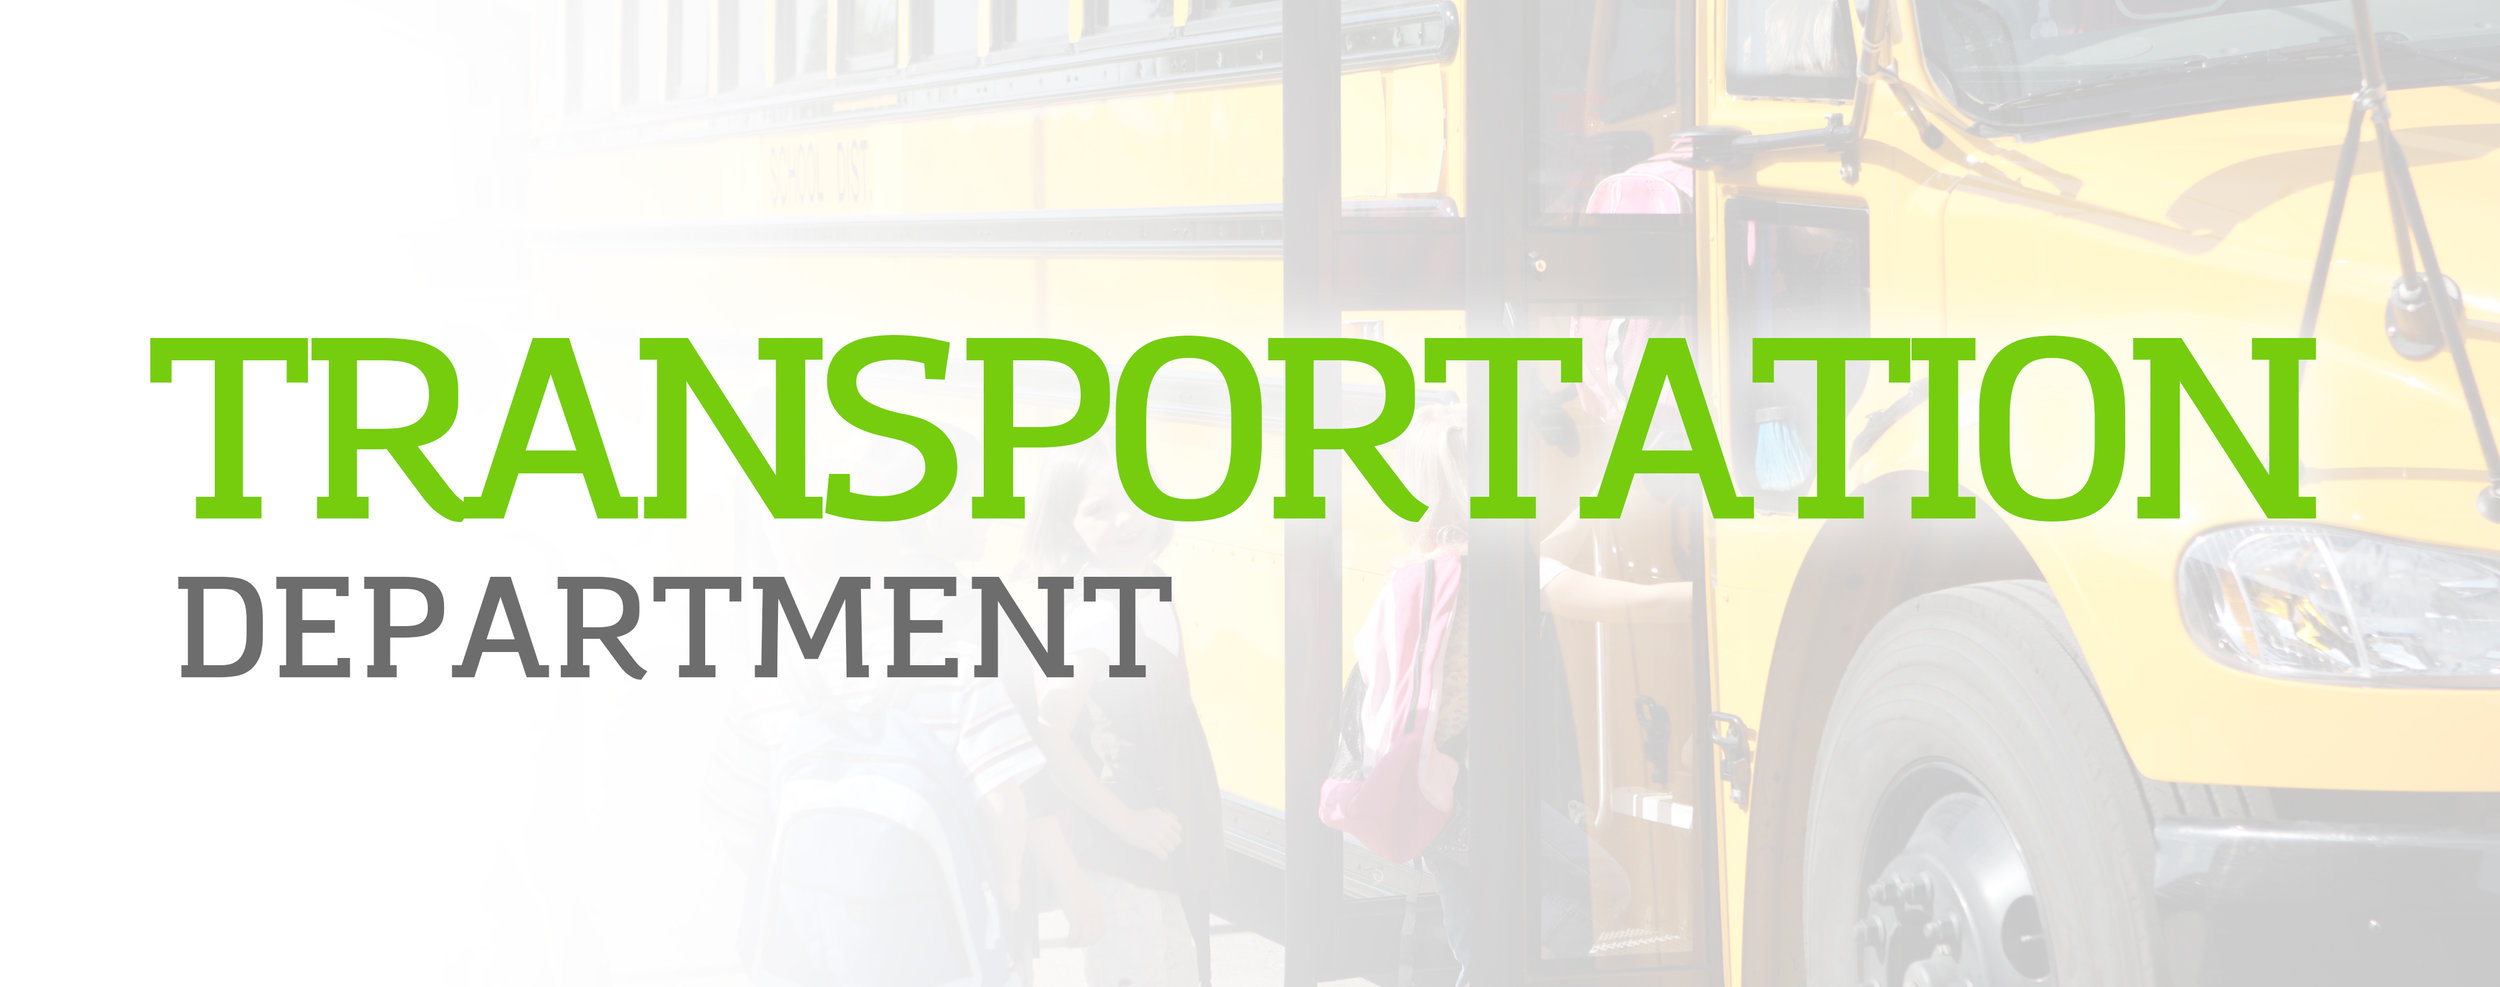 TransportationHeader-WebPage.jpg